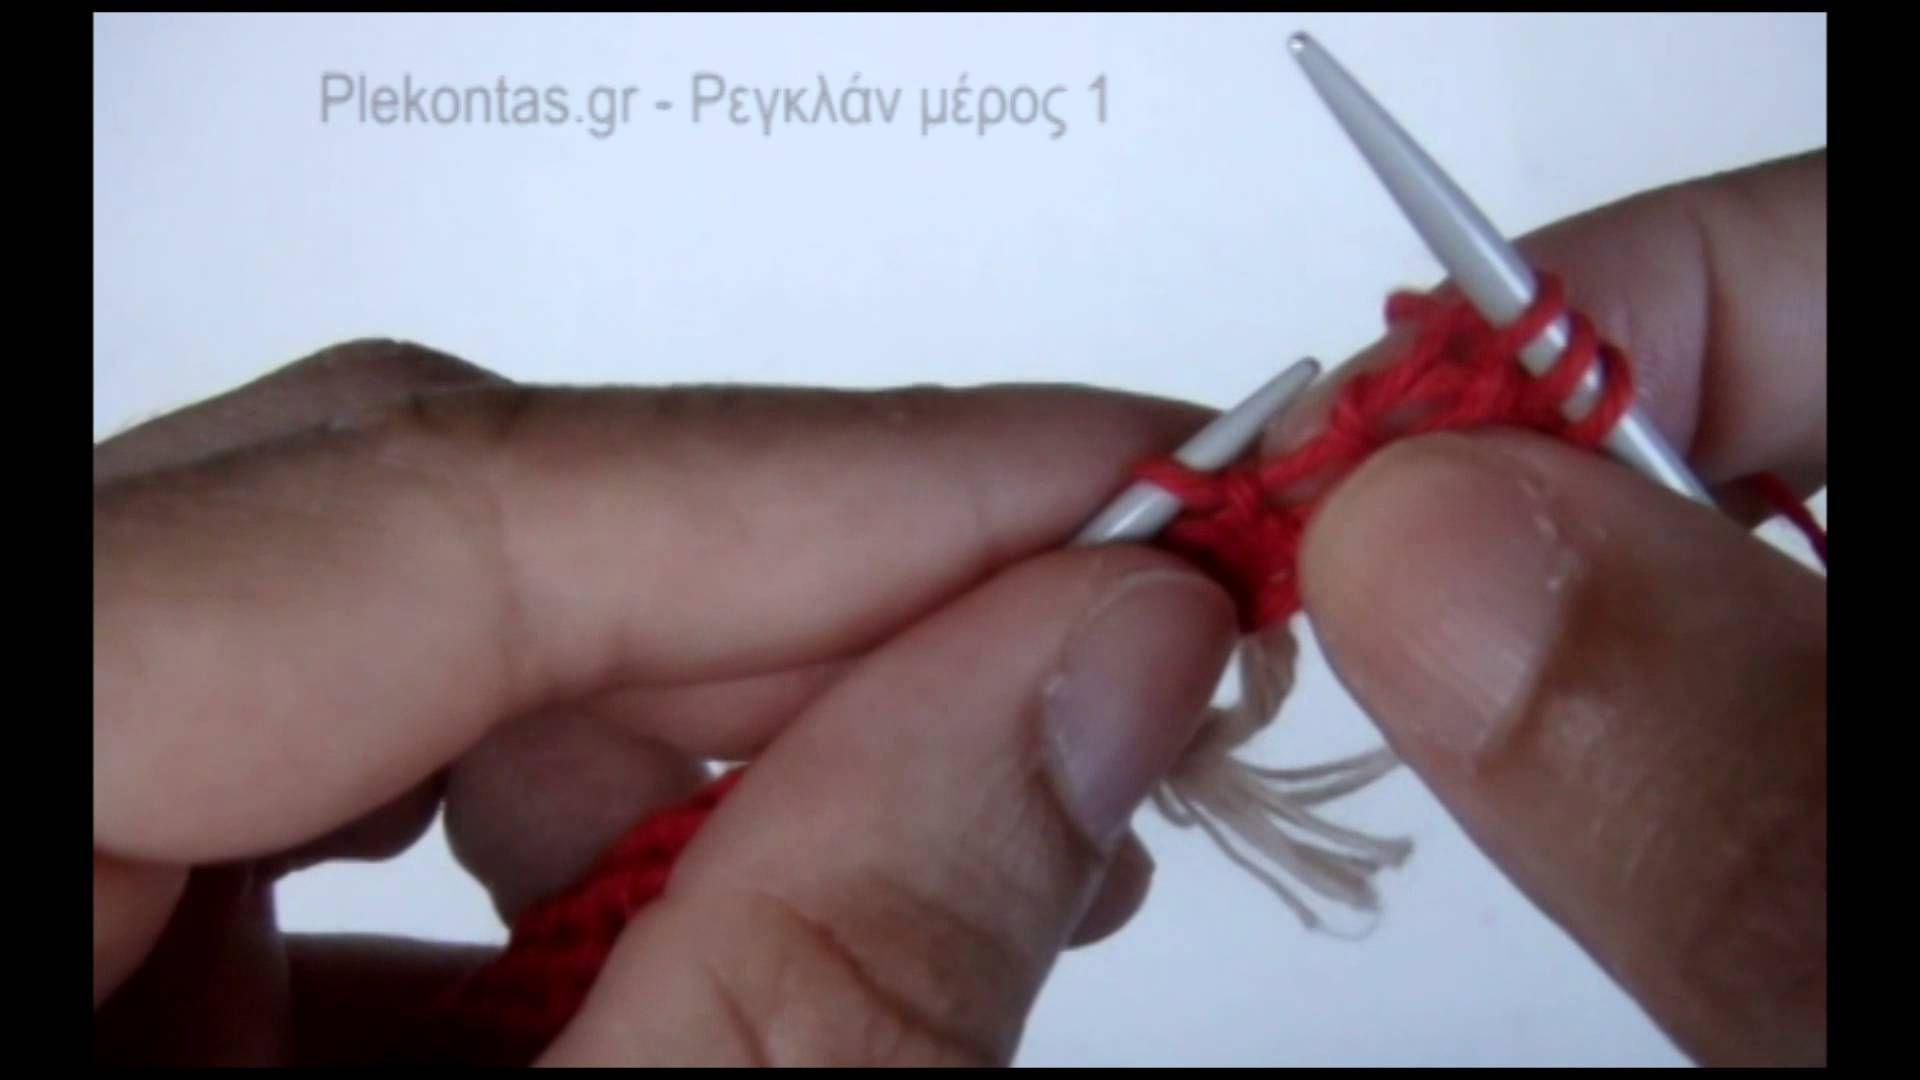 81df10dd644e Πλέξιμο πουλόβερ με ρεγκλάν τεχνική - Μέρος 1 | Βίντεο πλέξιμο με ...